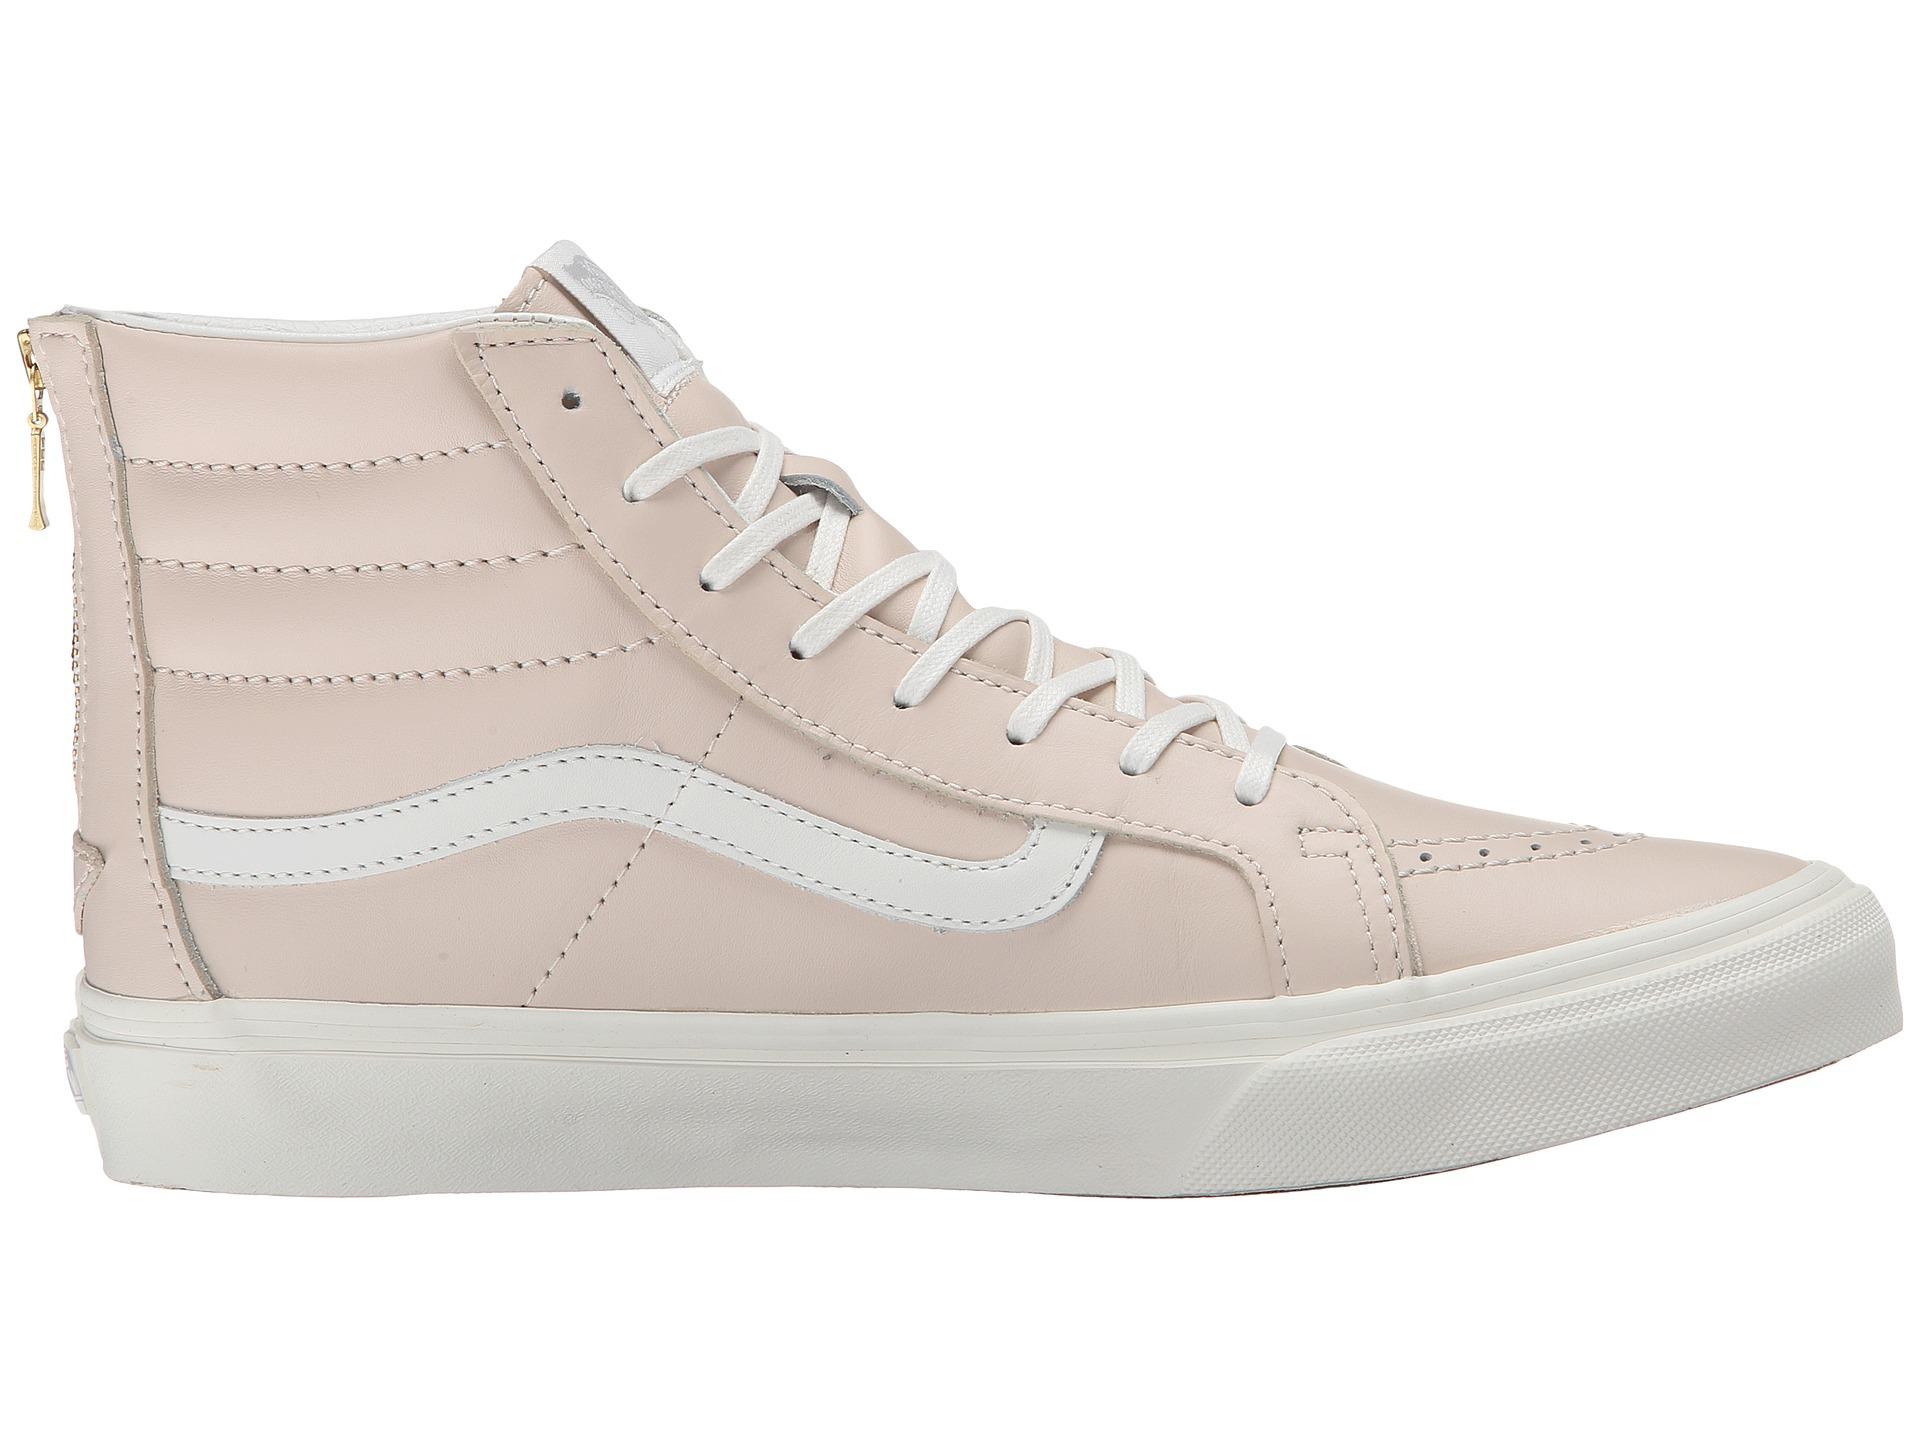 65876d5b15 Lyst - Vans Sk8-hi Slim Zip in Pink